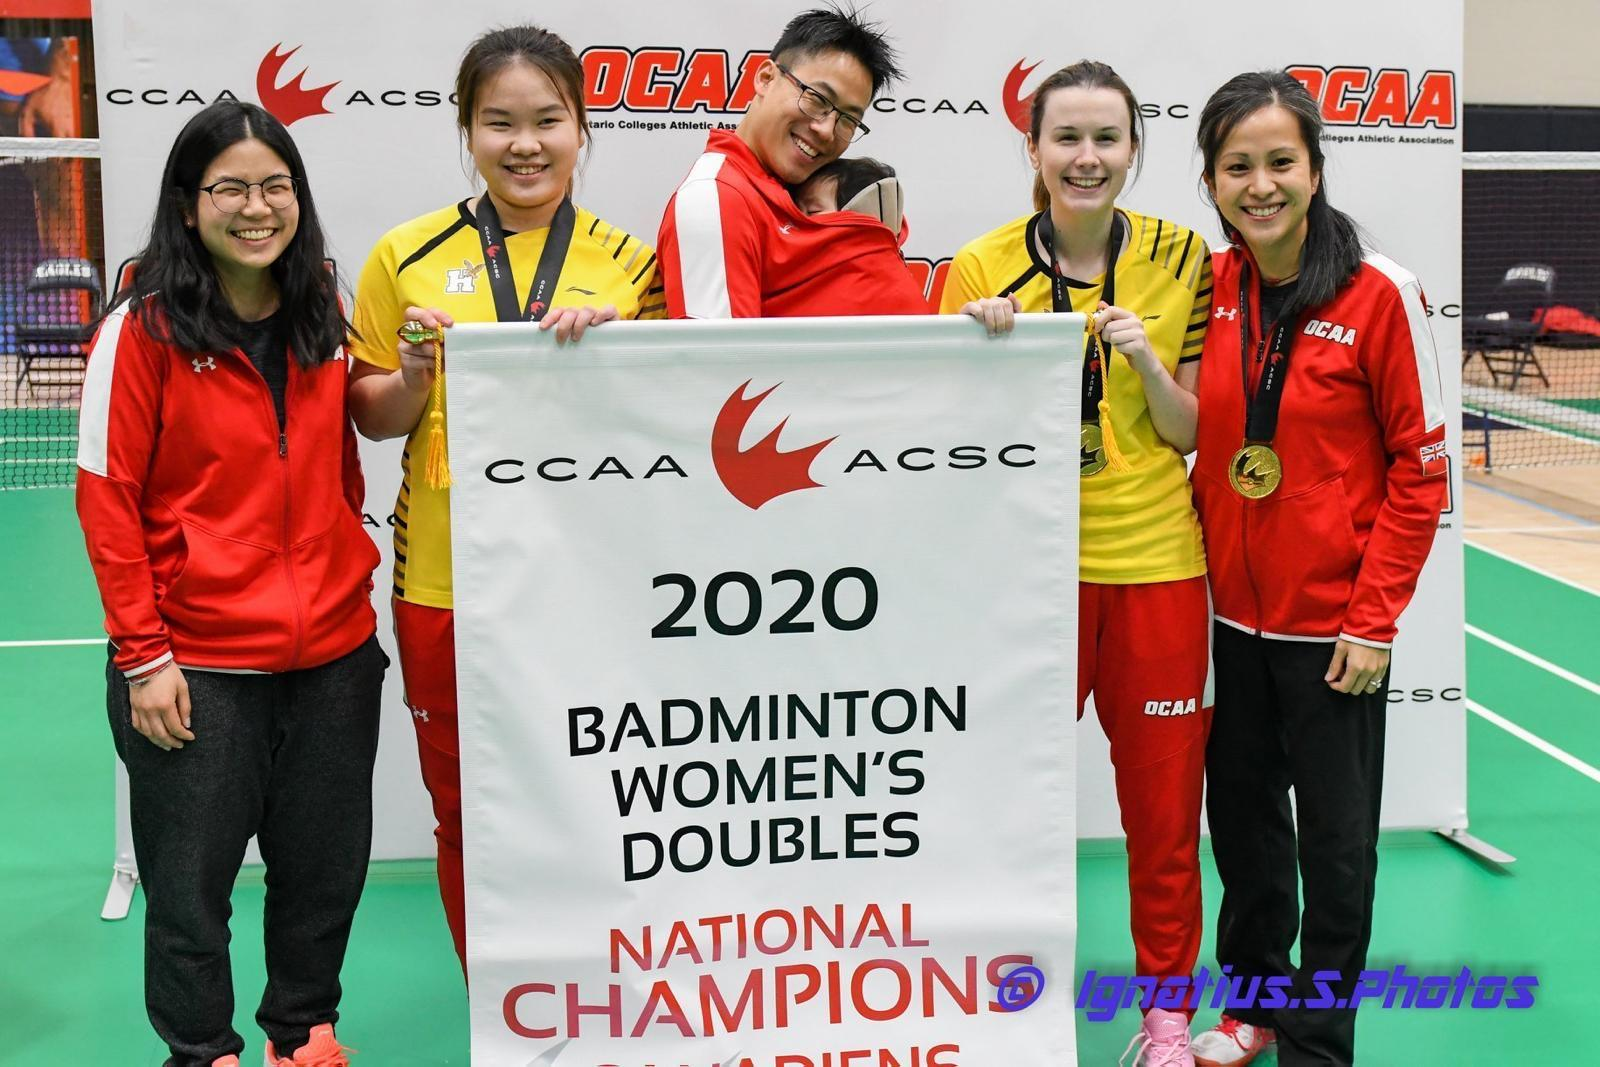 Humber Hawks badminton